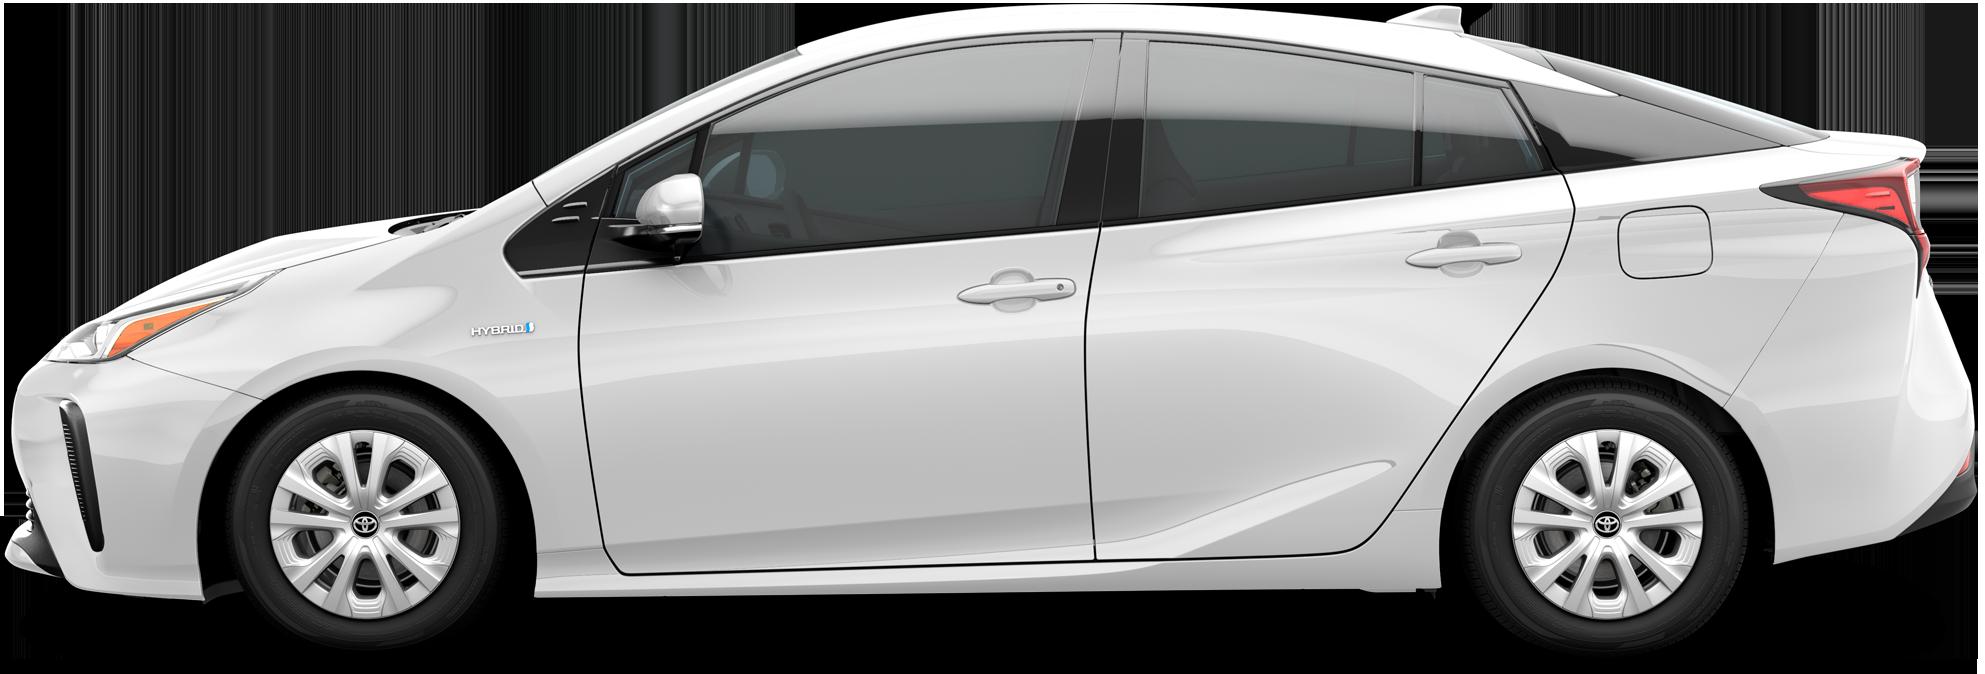 2020 Toyota Prius Hatchback L